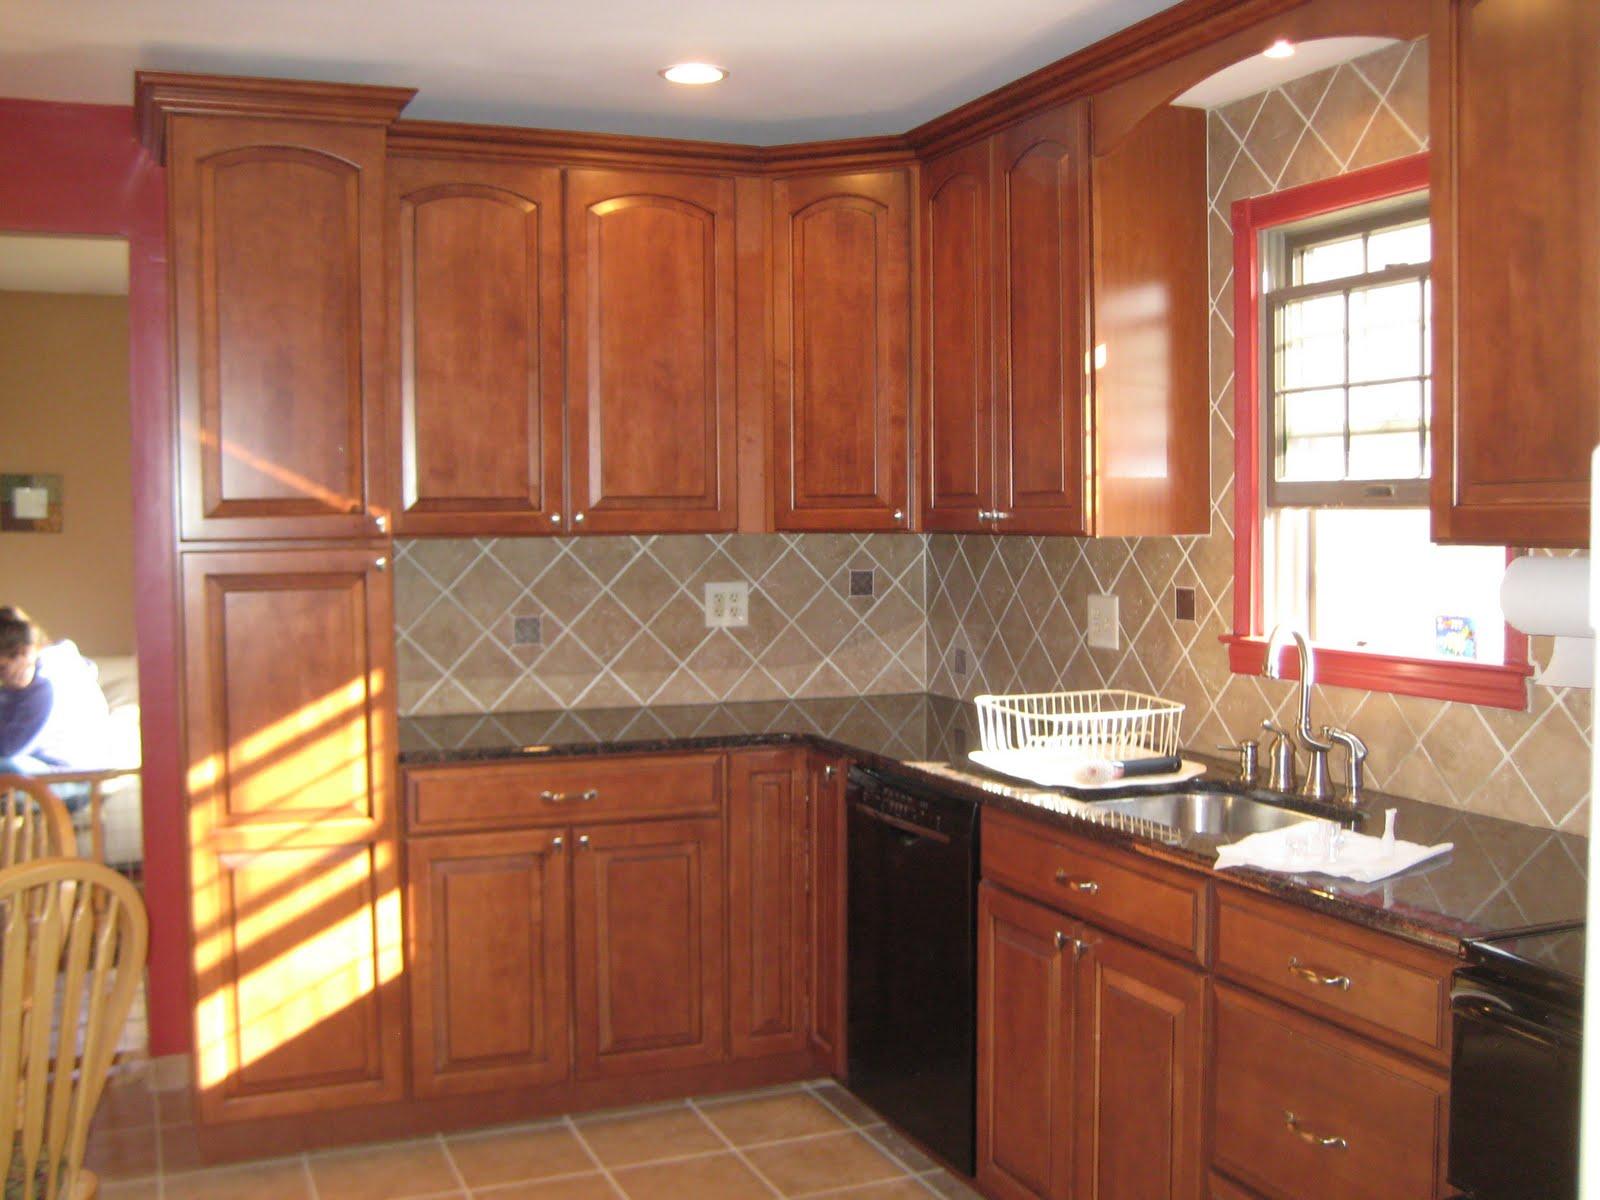 - Kitchen Backsplash Ideas Diy - Audreycouture